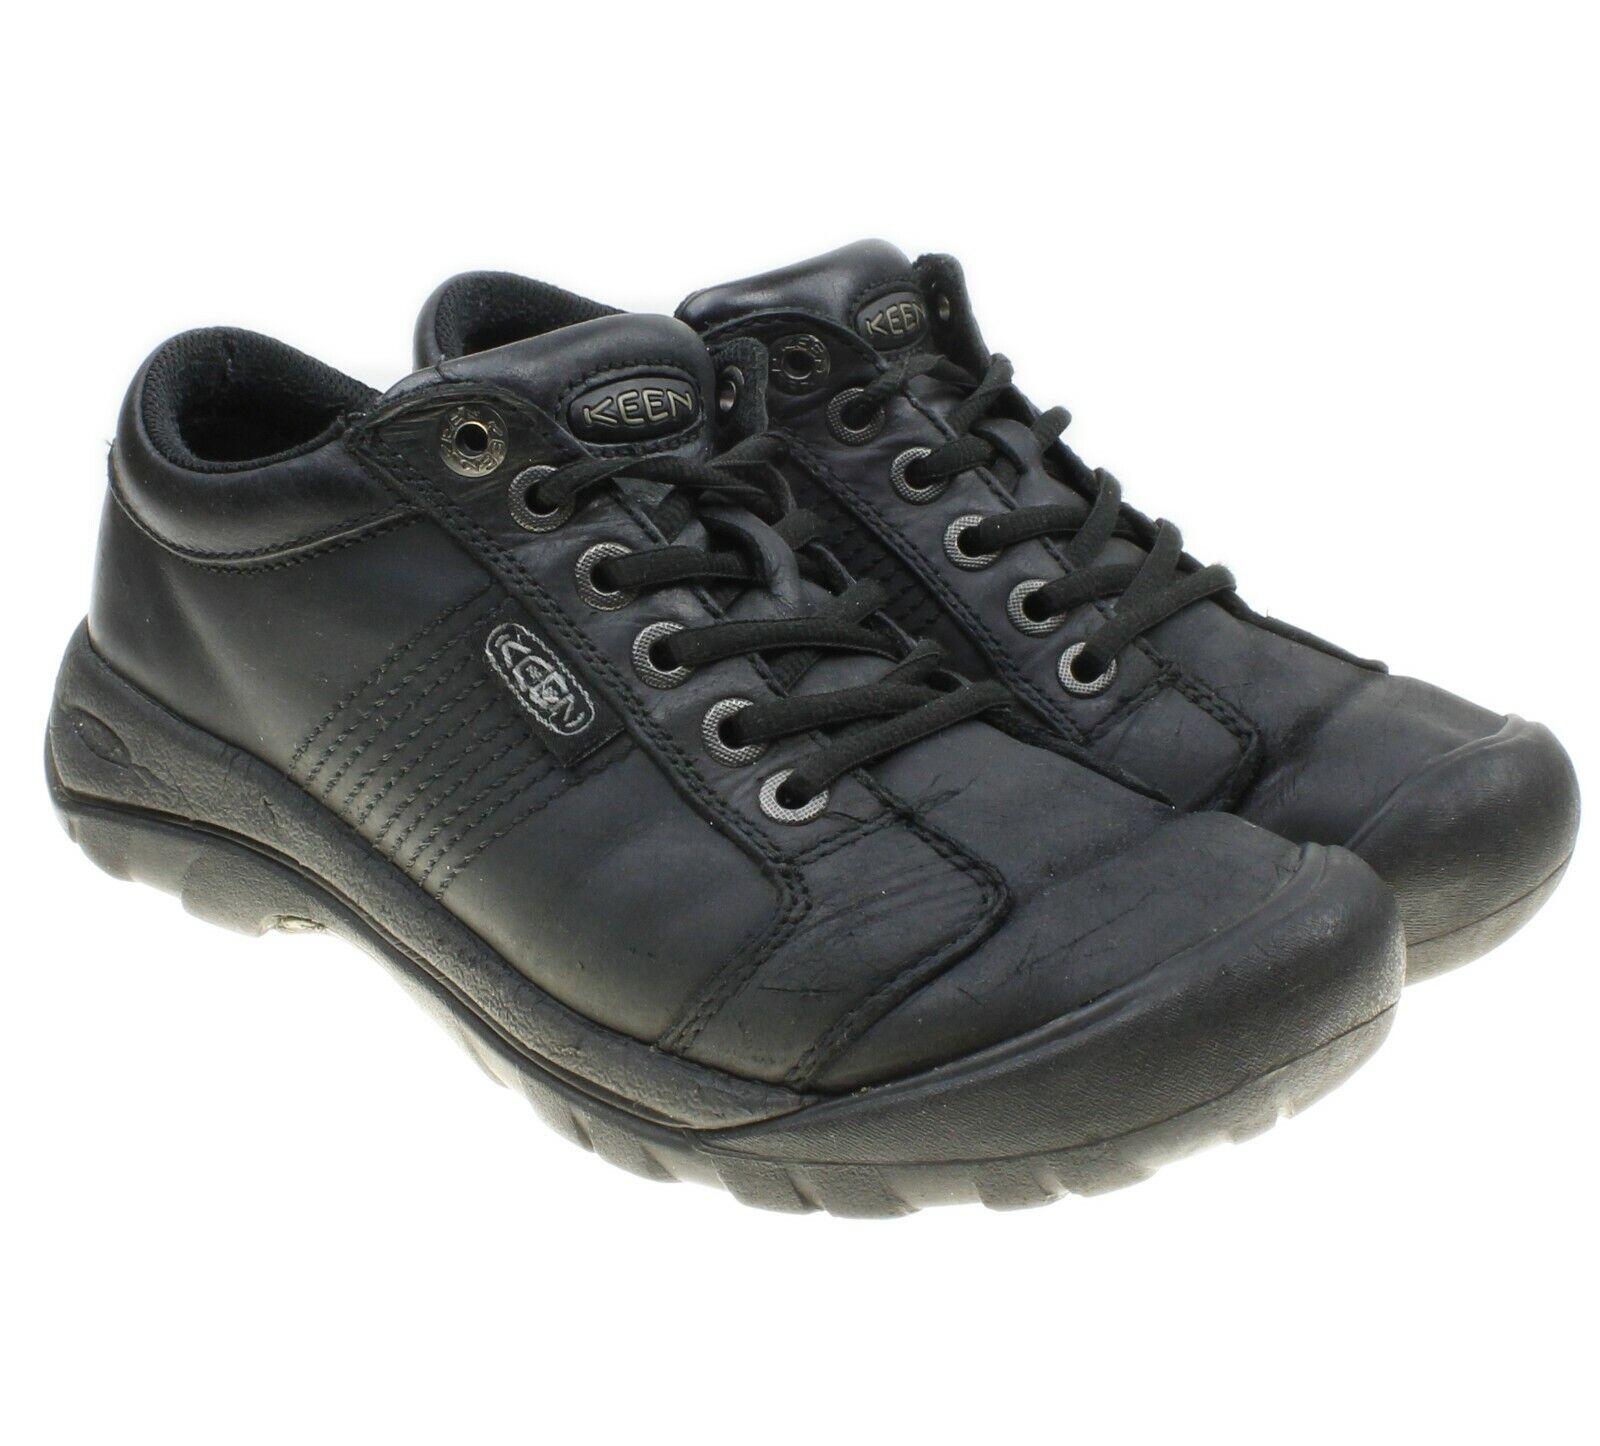 KEEN Austin Mens Black Lace-ups Leather Waterproof Hiking Walking shoes Size 7